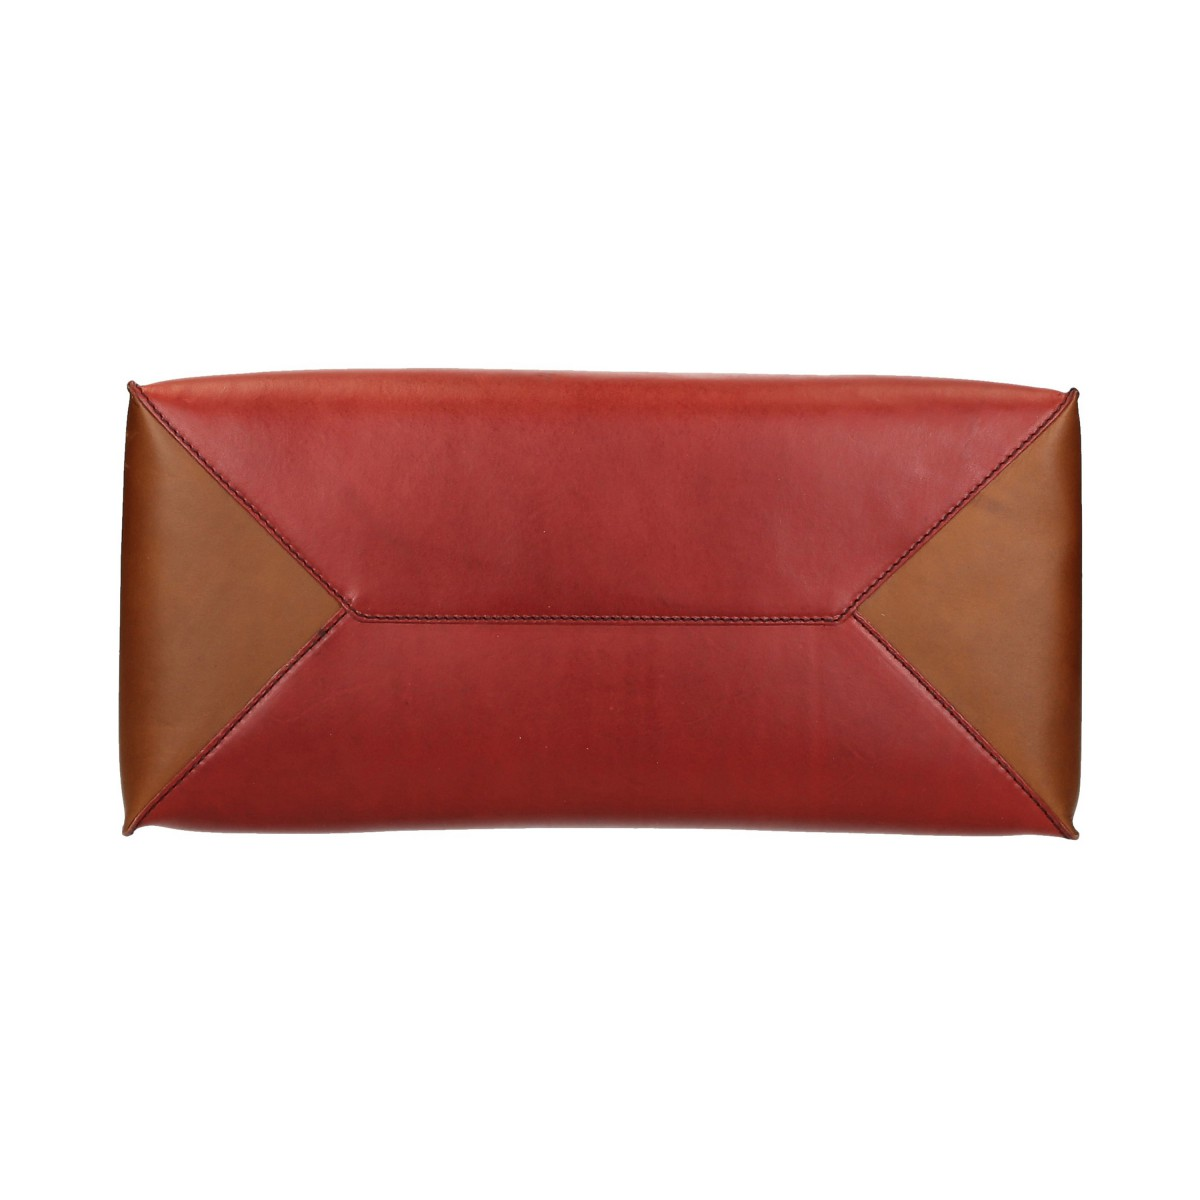 Two Tone Nylon Woman Bag For 10